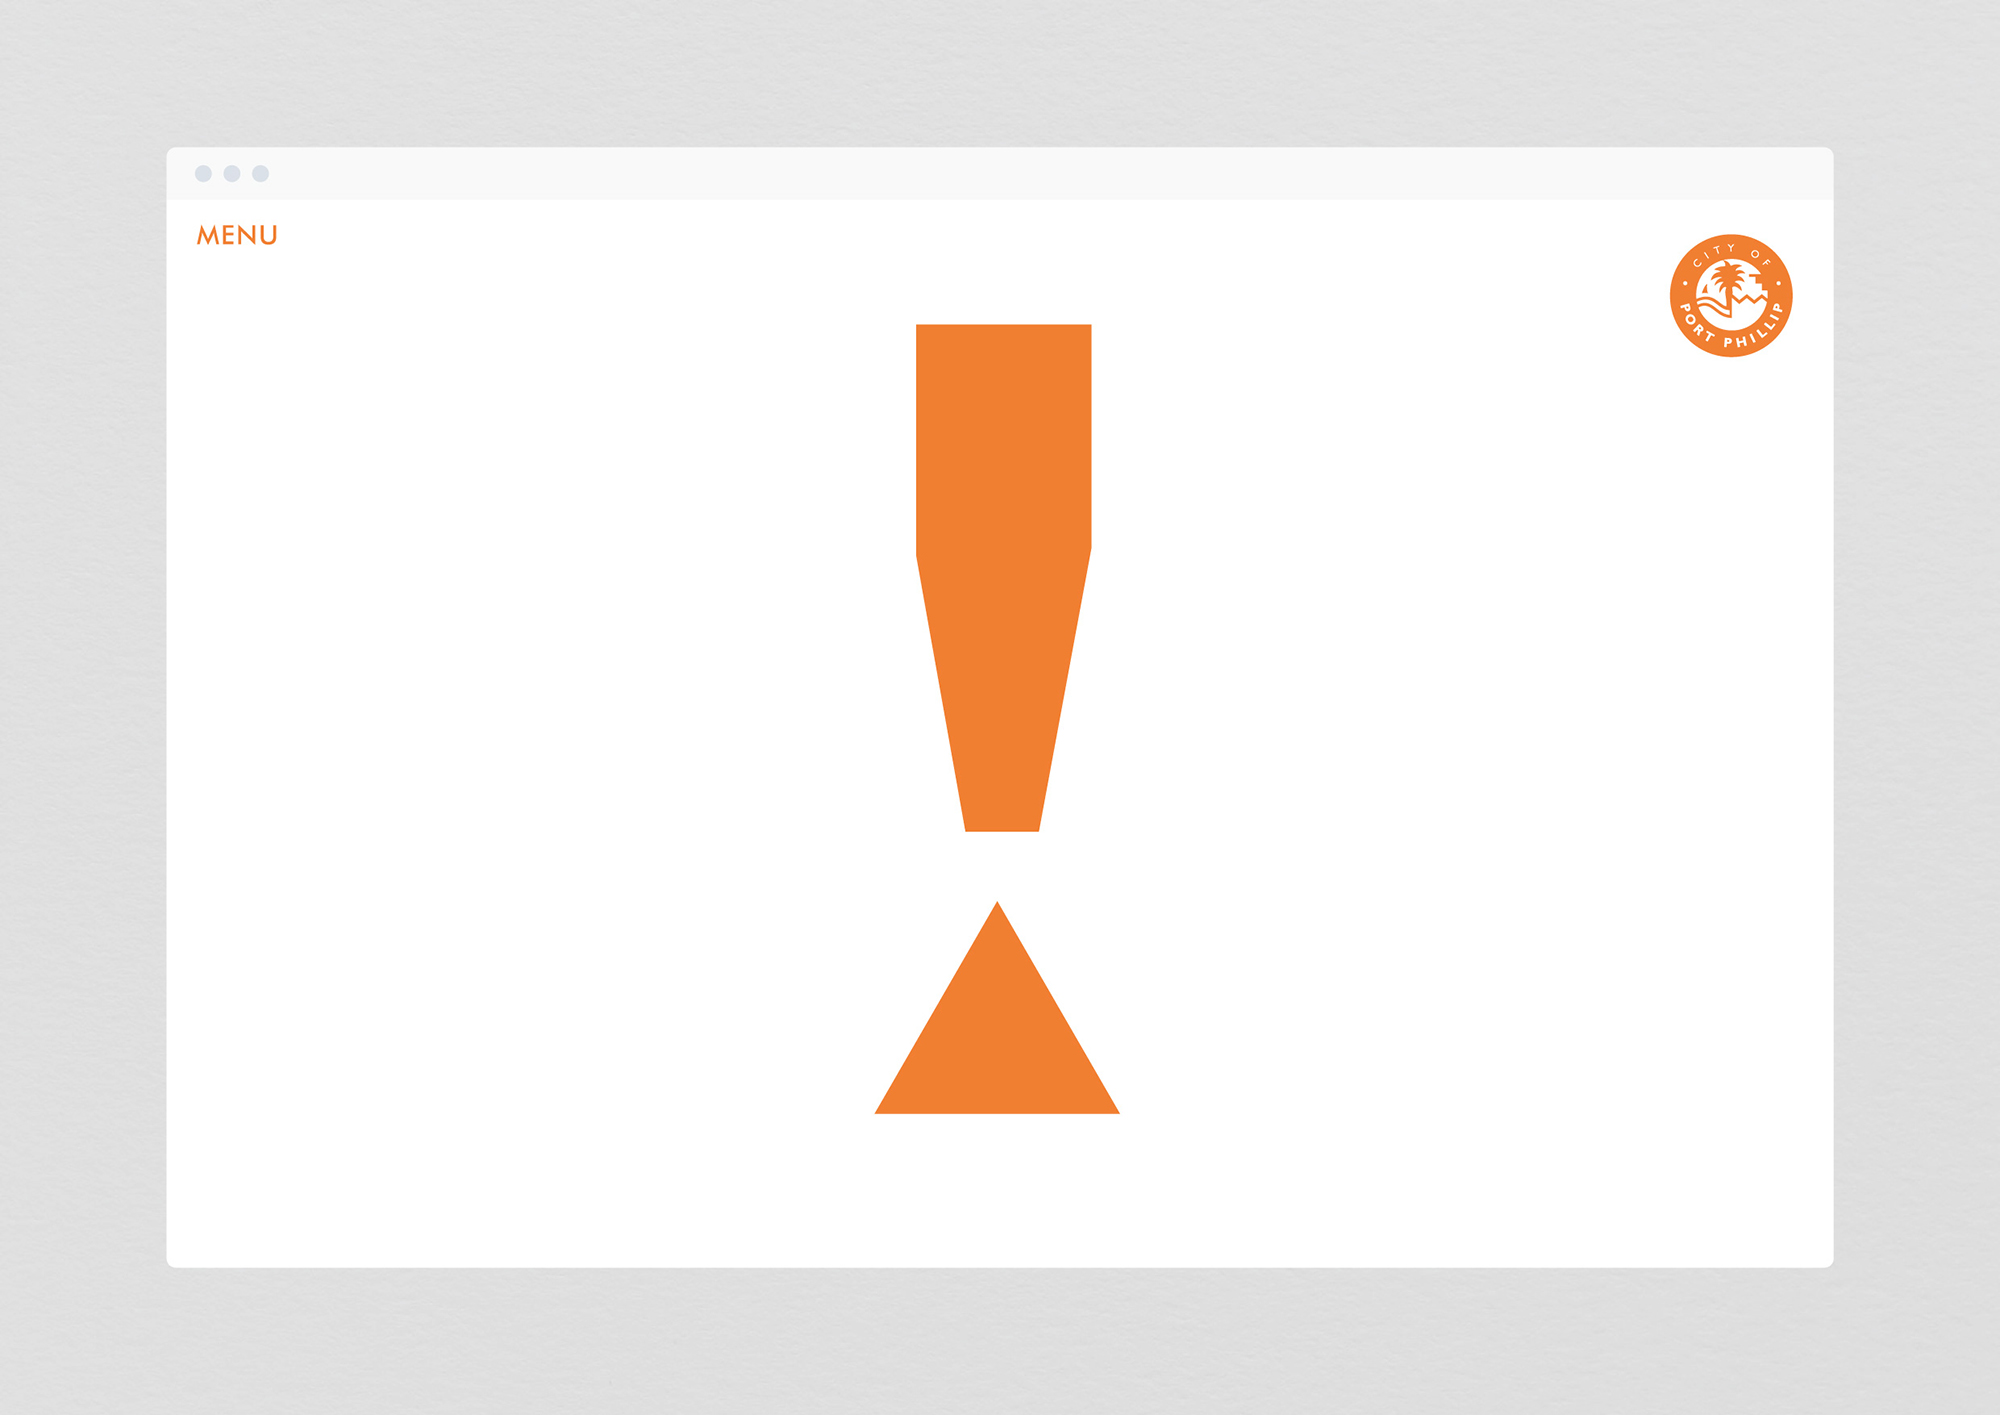 Big_CS_St Kilda Triangle_2017-b-06.jpg